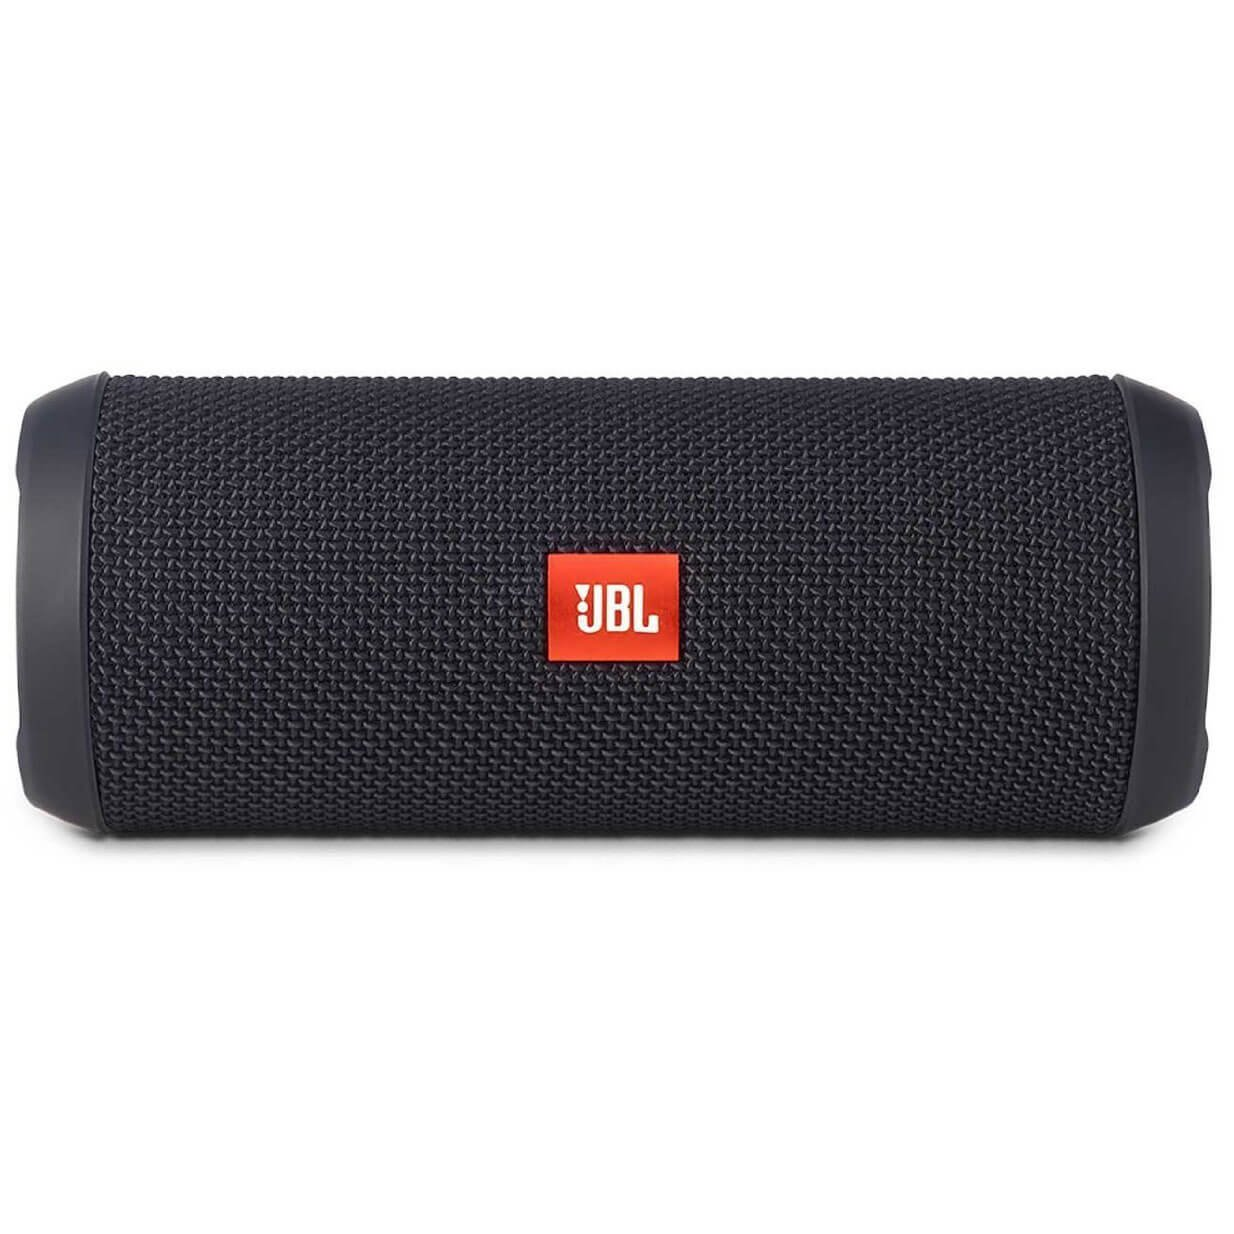 JBL Flip 3 Splashproof Portable Stereo Bluetooth Speaker